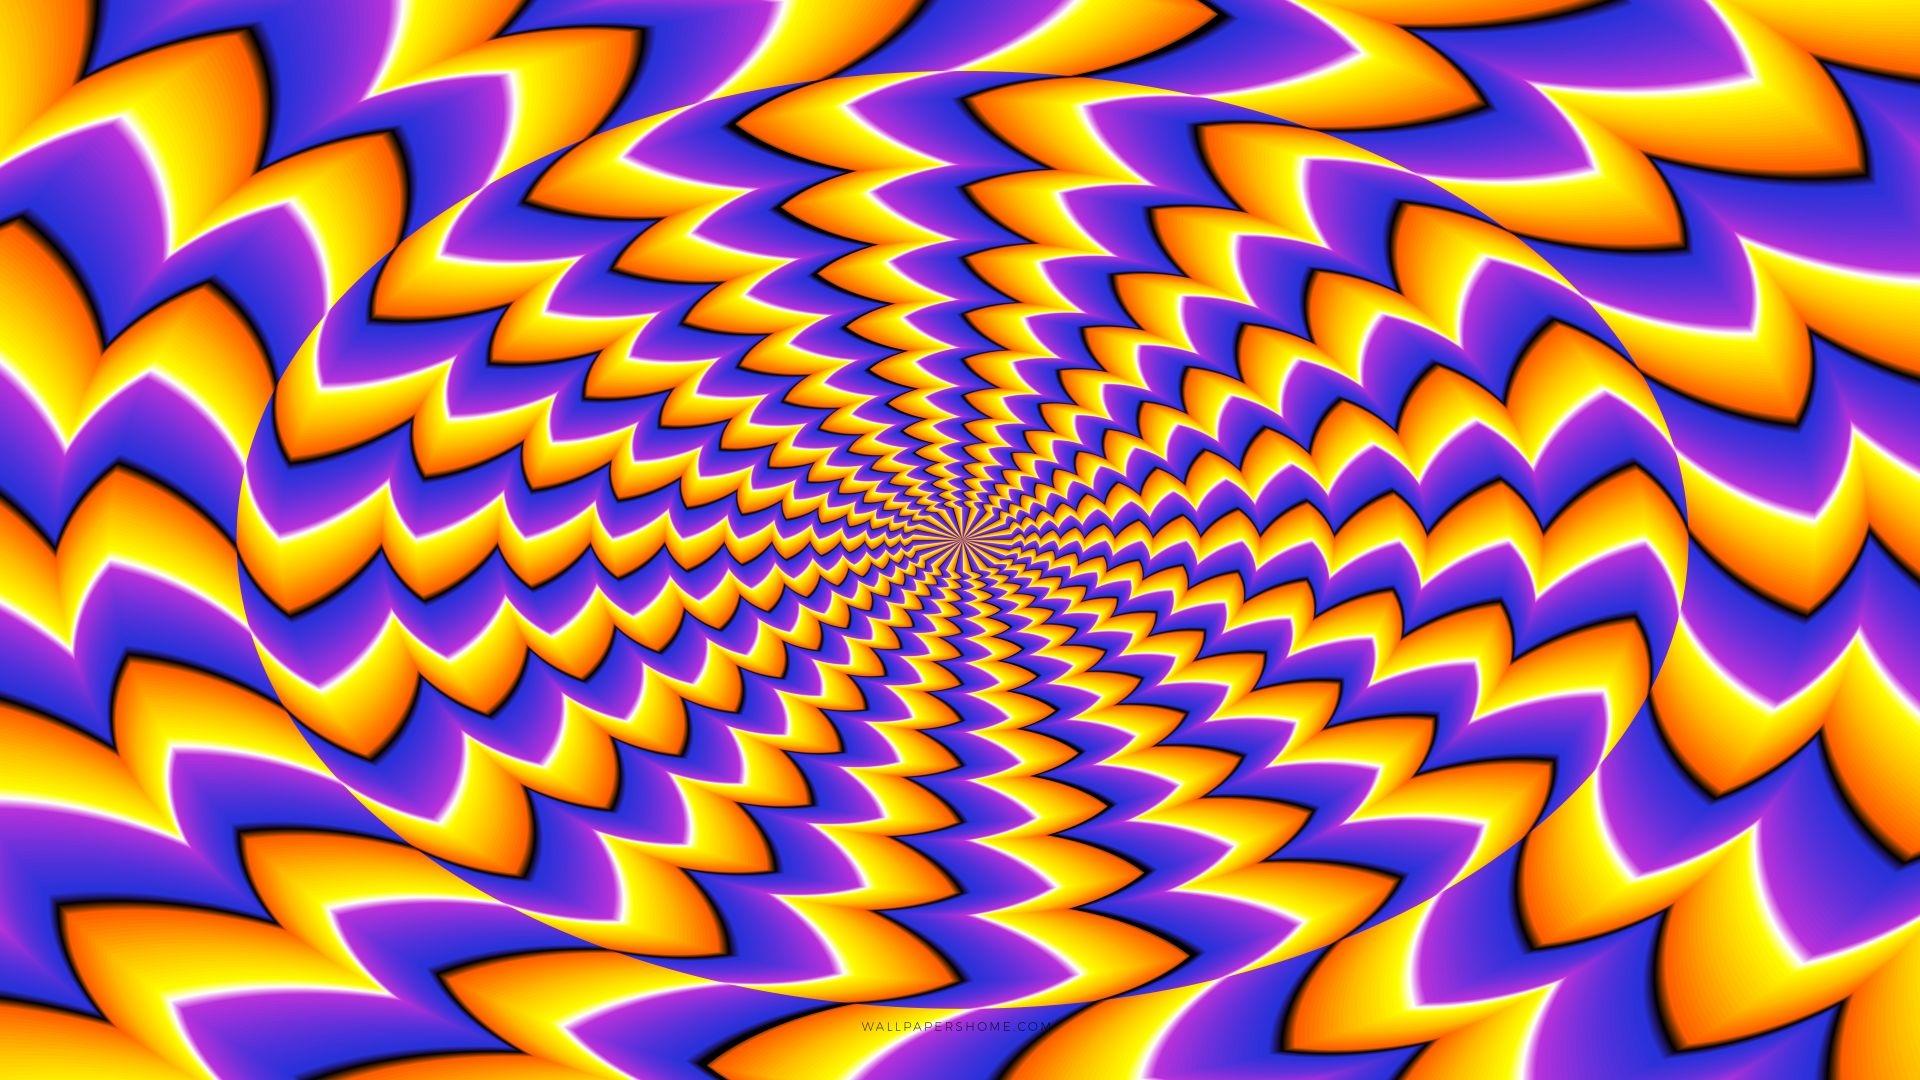 Illusion Download Wallpaper